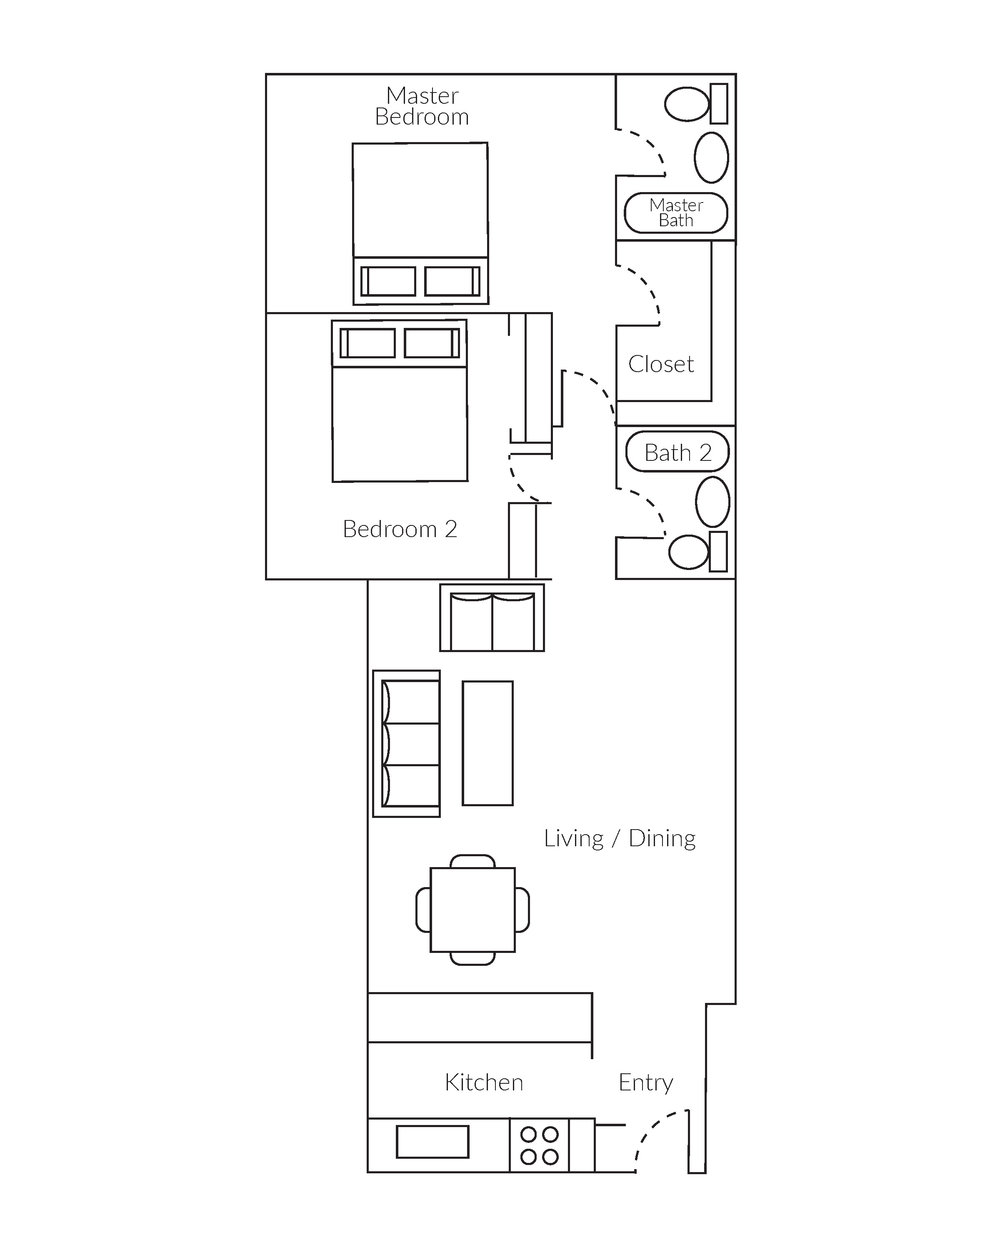 2 Bedroom, 2 Bathroom High Rise Apartment